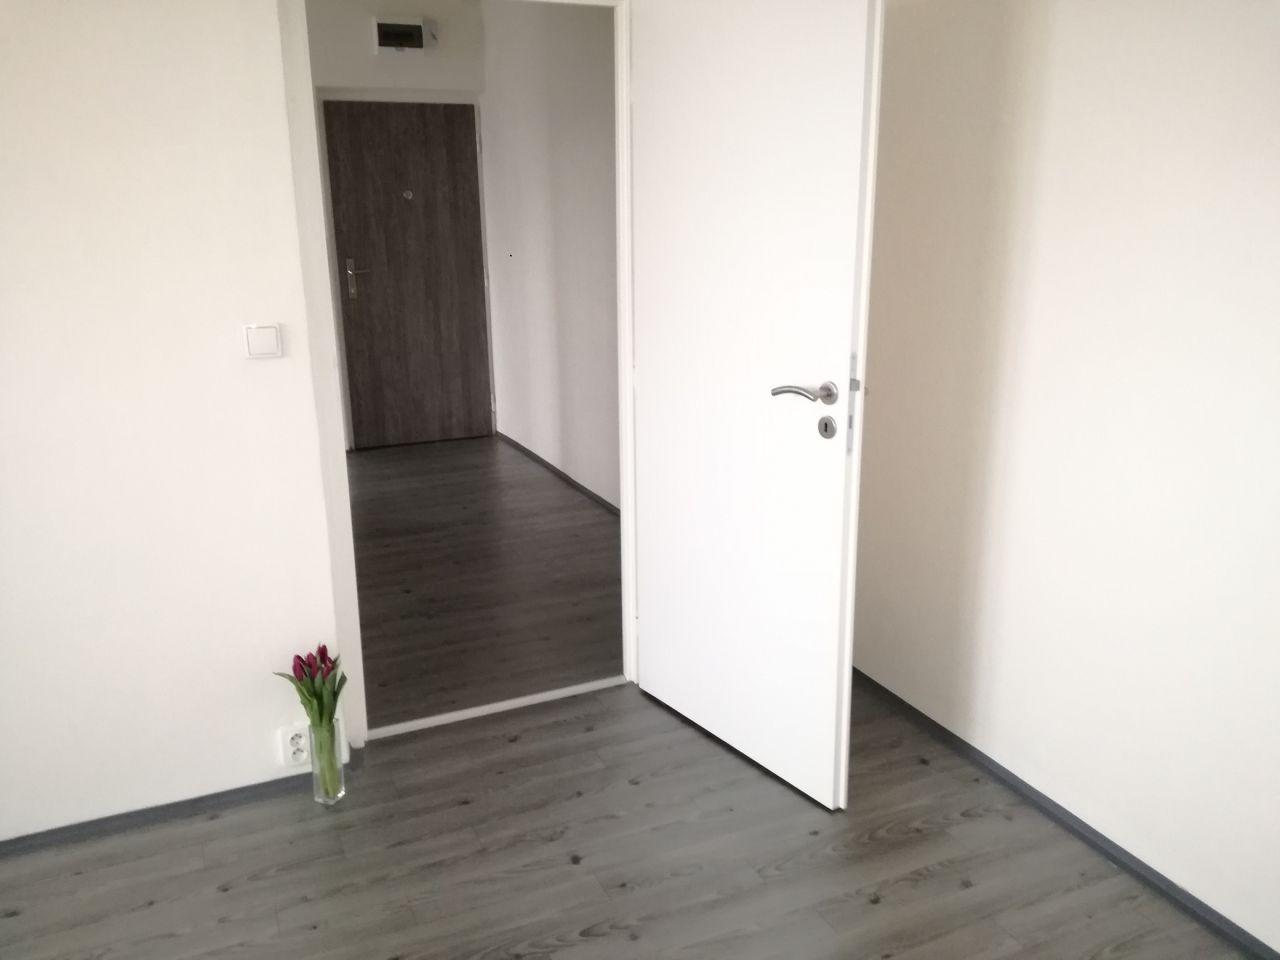 Pronájem bytu 2+1 50 m2, ul. Františka Hajdy 1229/8, Ostrava - Hrabůvka